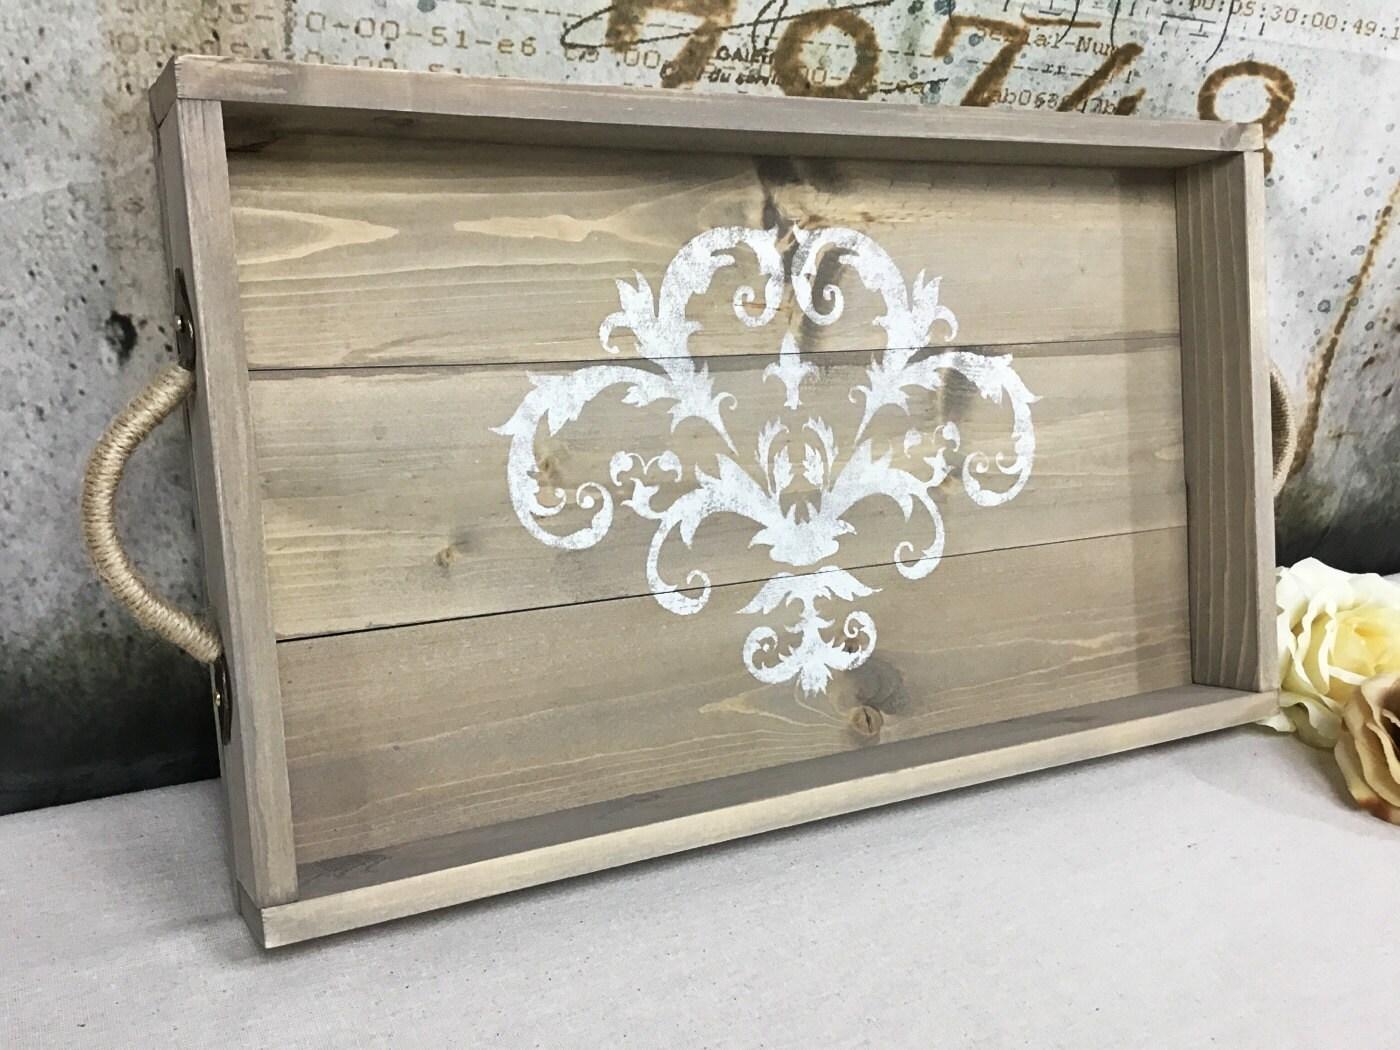 wood serving tray shabby chic decor smoky gray - Decorative Serving Trays